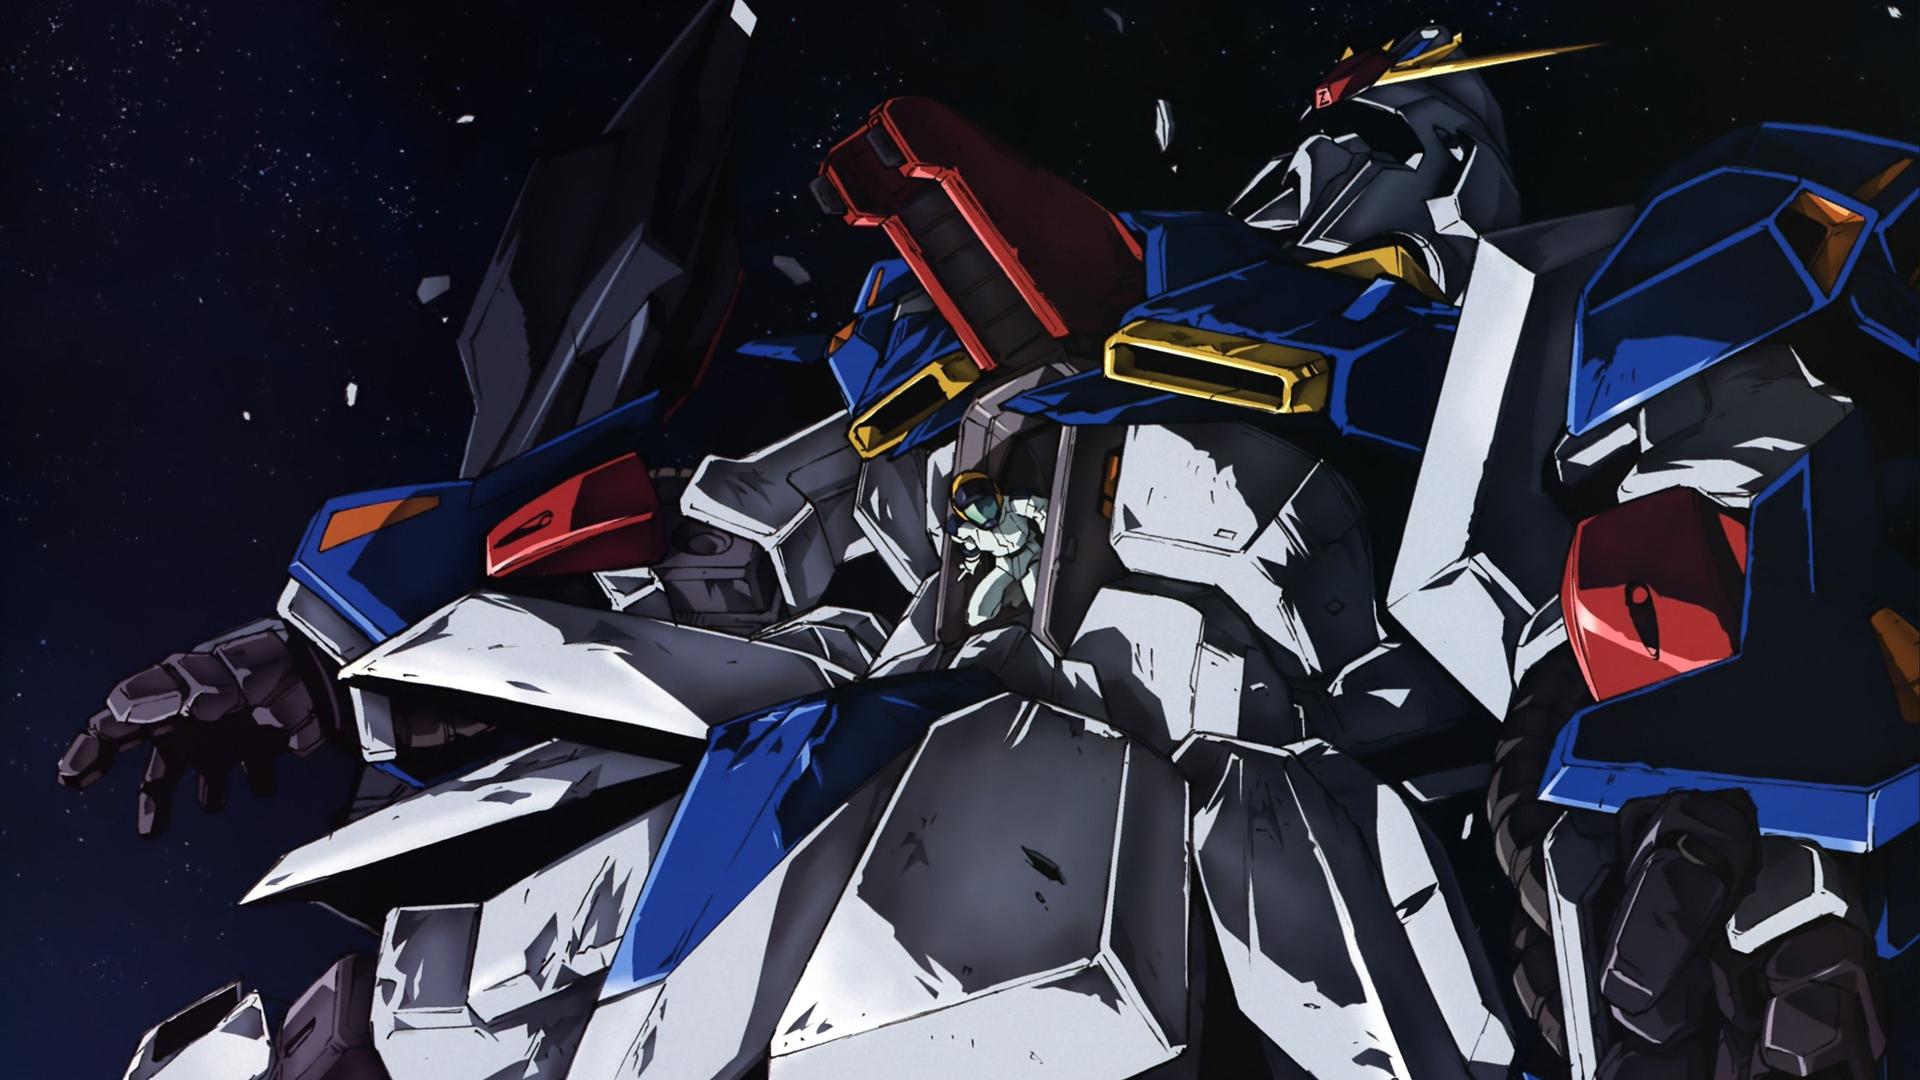 Download Gundam Wallpaper 1920x1080 Wallpoper 415384 1920x1080